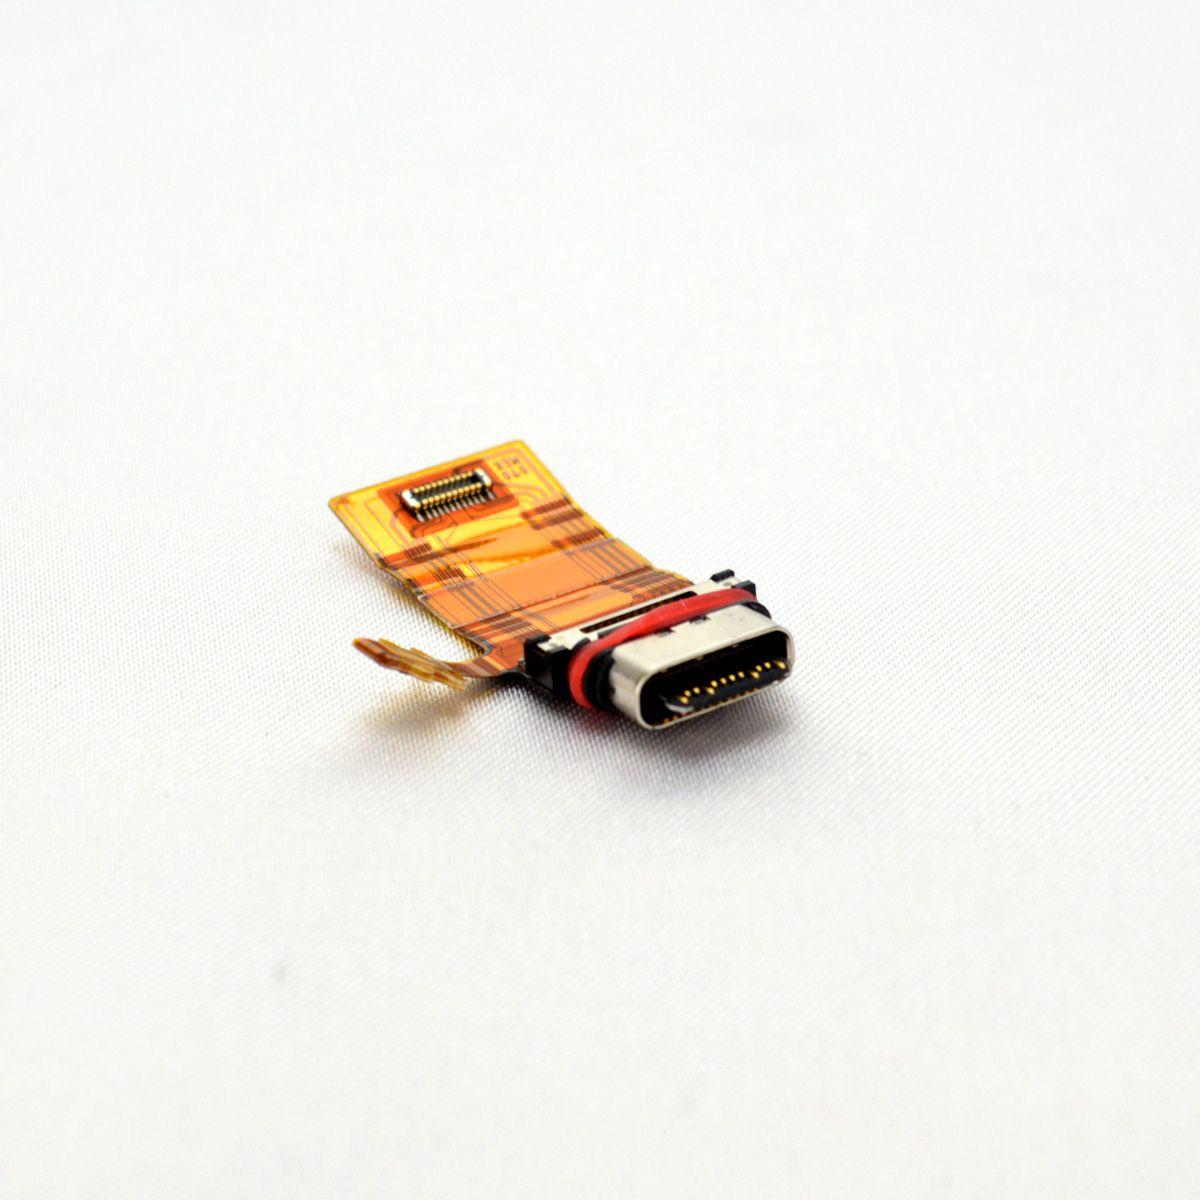 【SONY Xperia XZ1】ドックコネクター エクスぺリア Type-C USB充電口交換用パーツ【SO-01K SOV36】【メール便なら送料無料】